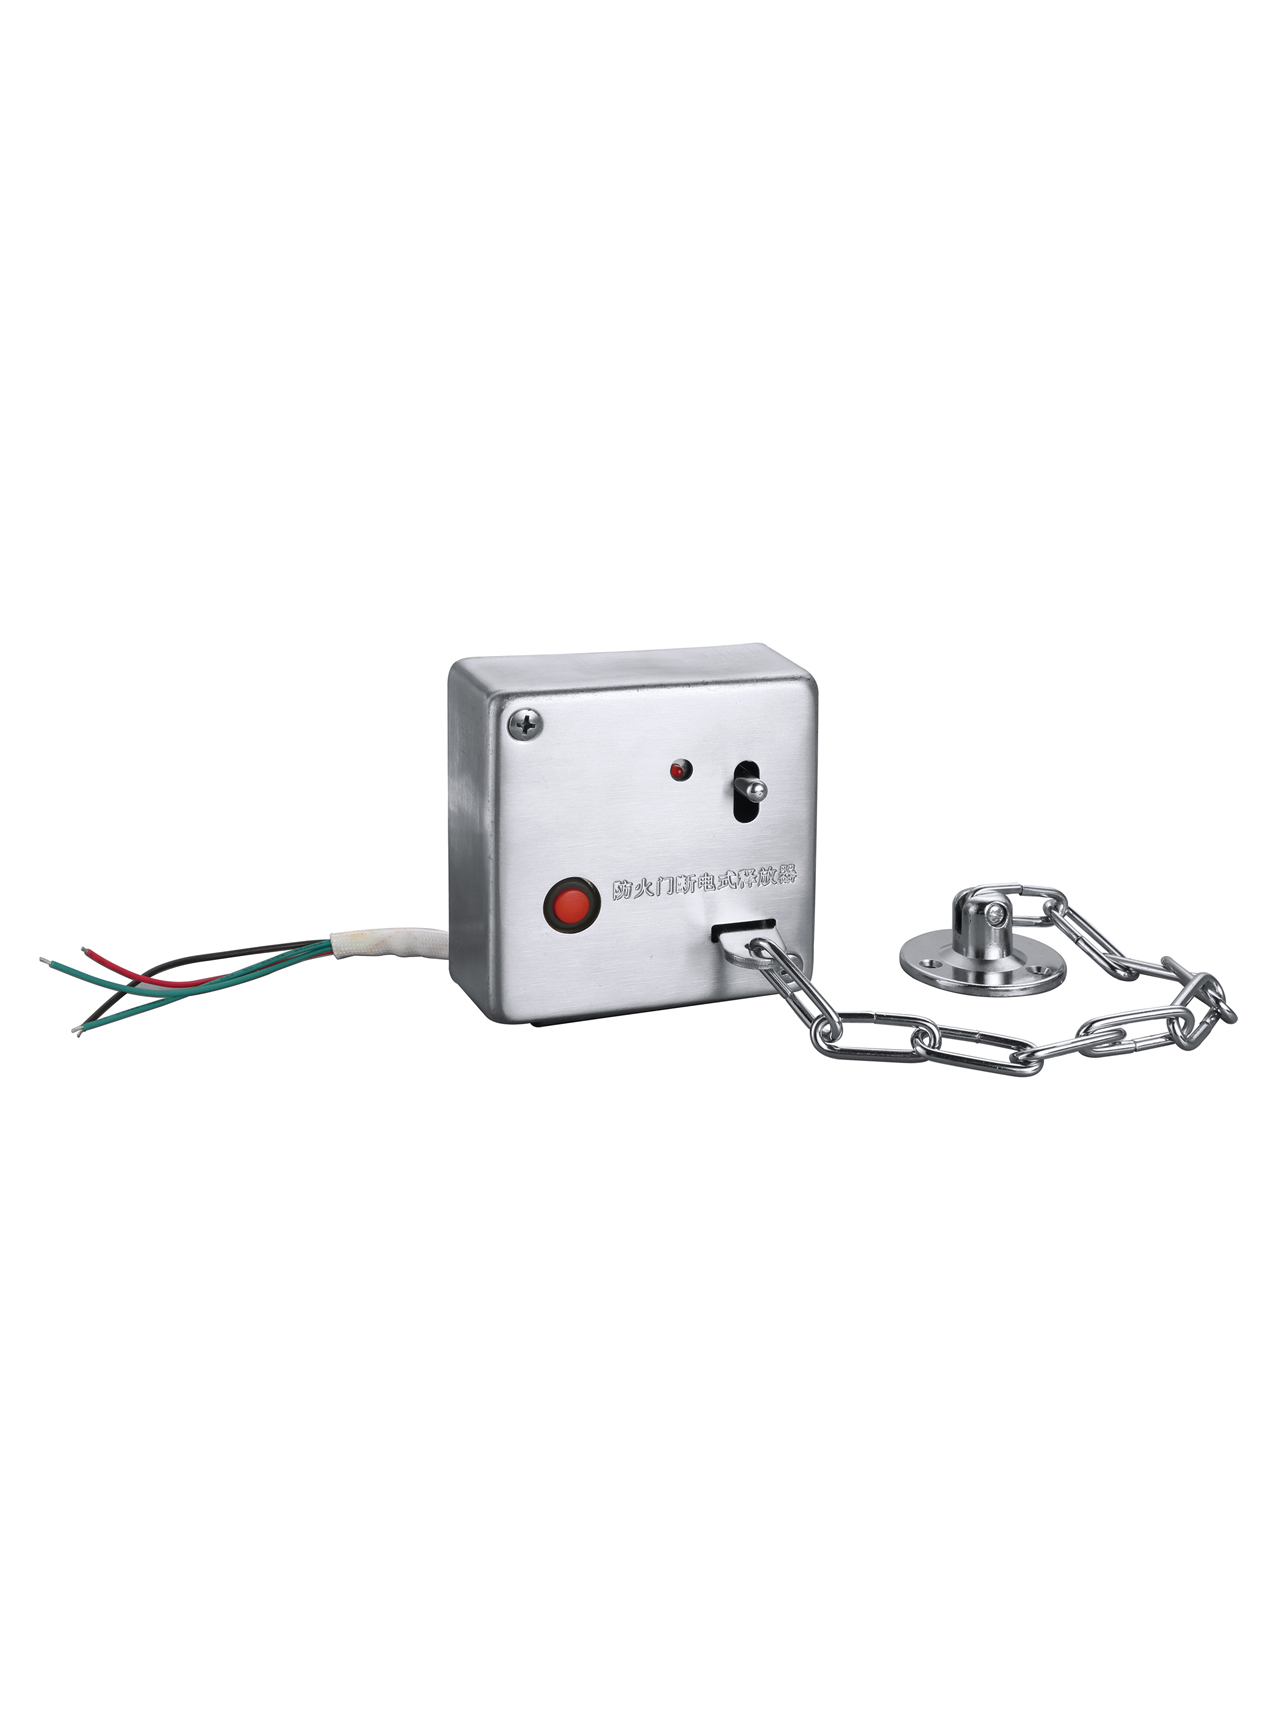 H-21 電磁釋放器(斷電)